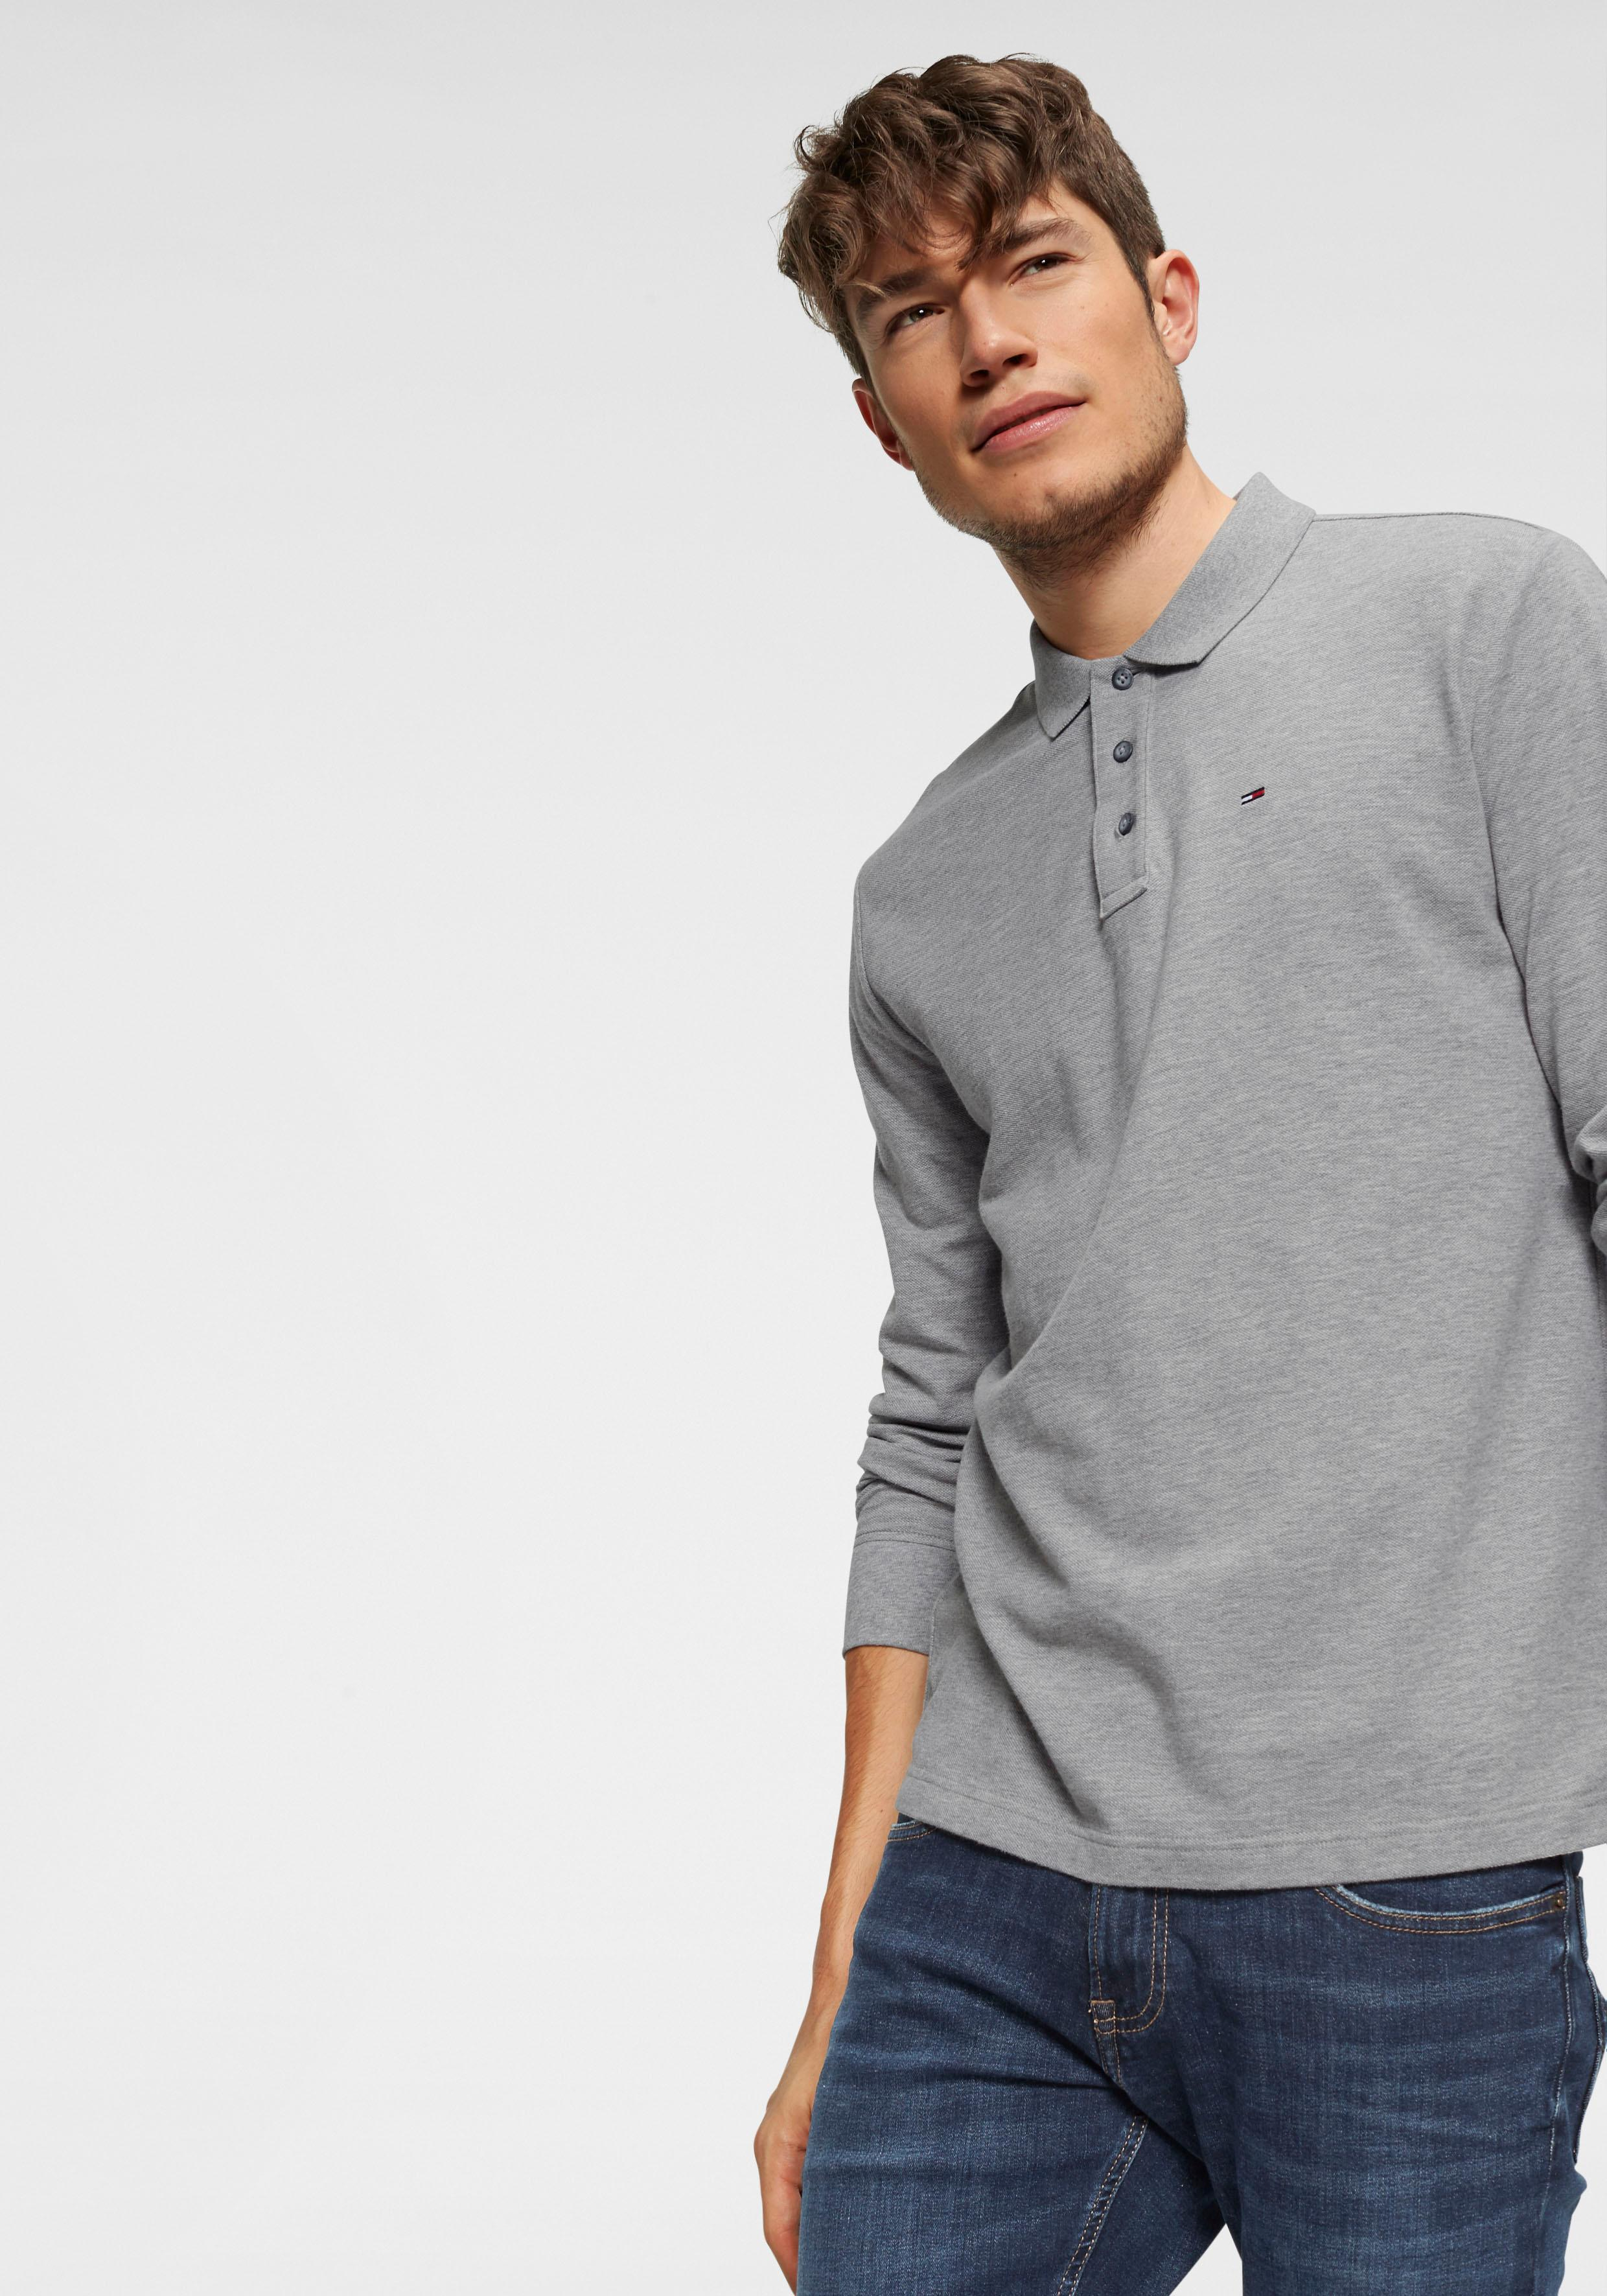 TOMMY JEANS Langarm-Poloshirt TJM ESSENTIAL LS POLO   Bekleidung > Shirts > Langarm Shirts   Tommy Jeans